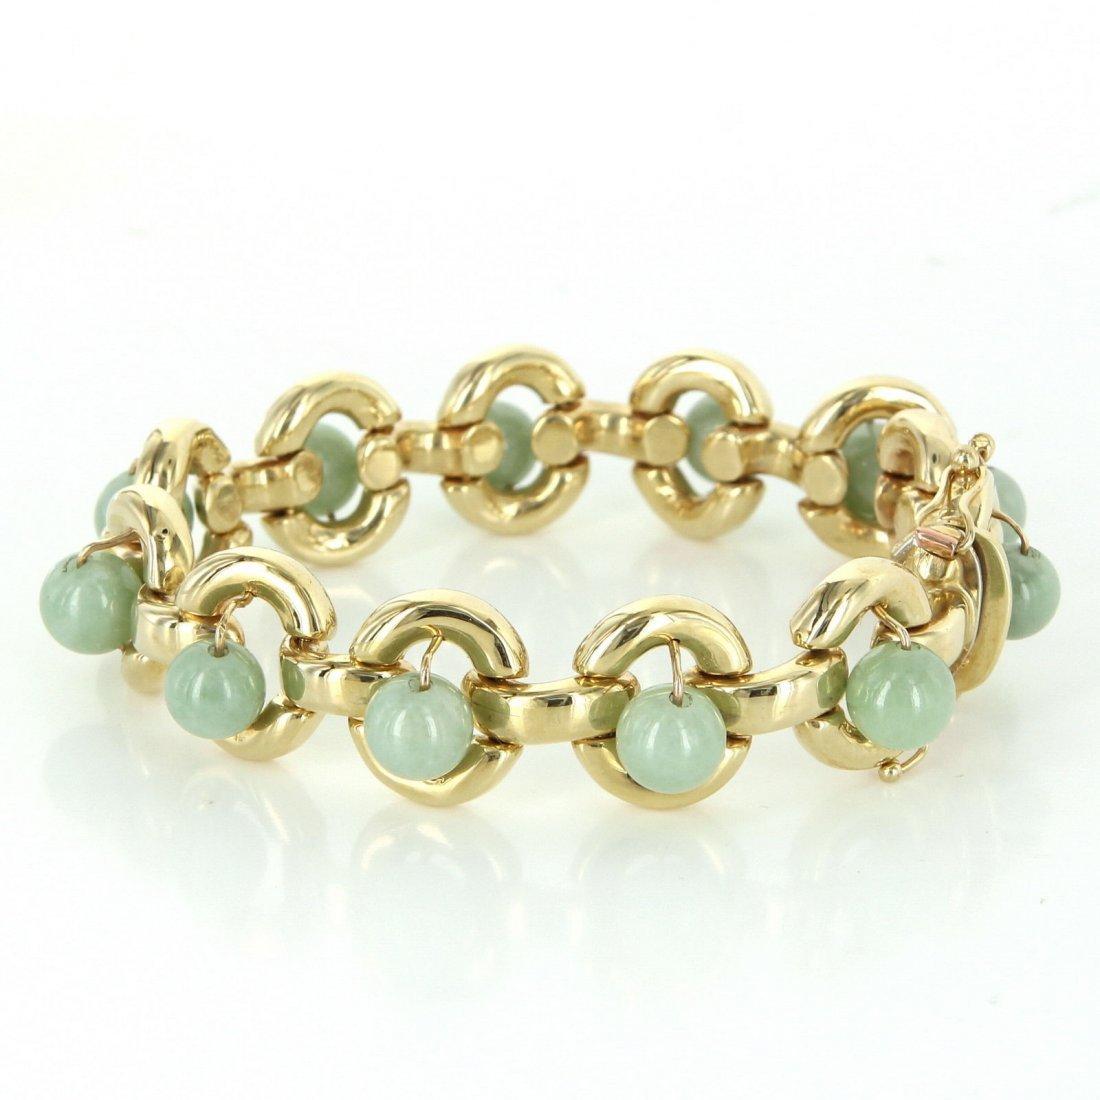 Vintage Jade Round Link Bracelet Heavy 14k Yellow Gold